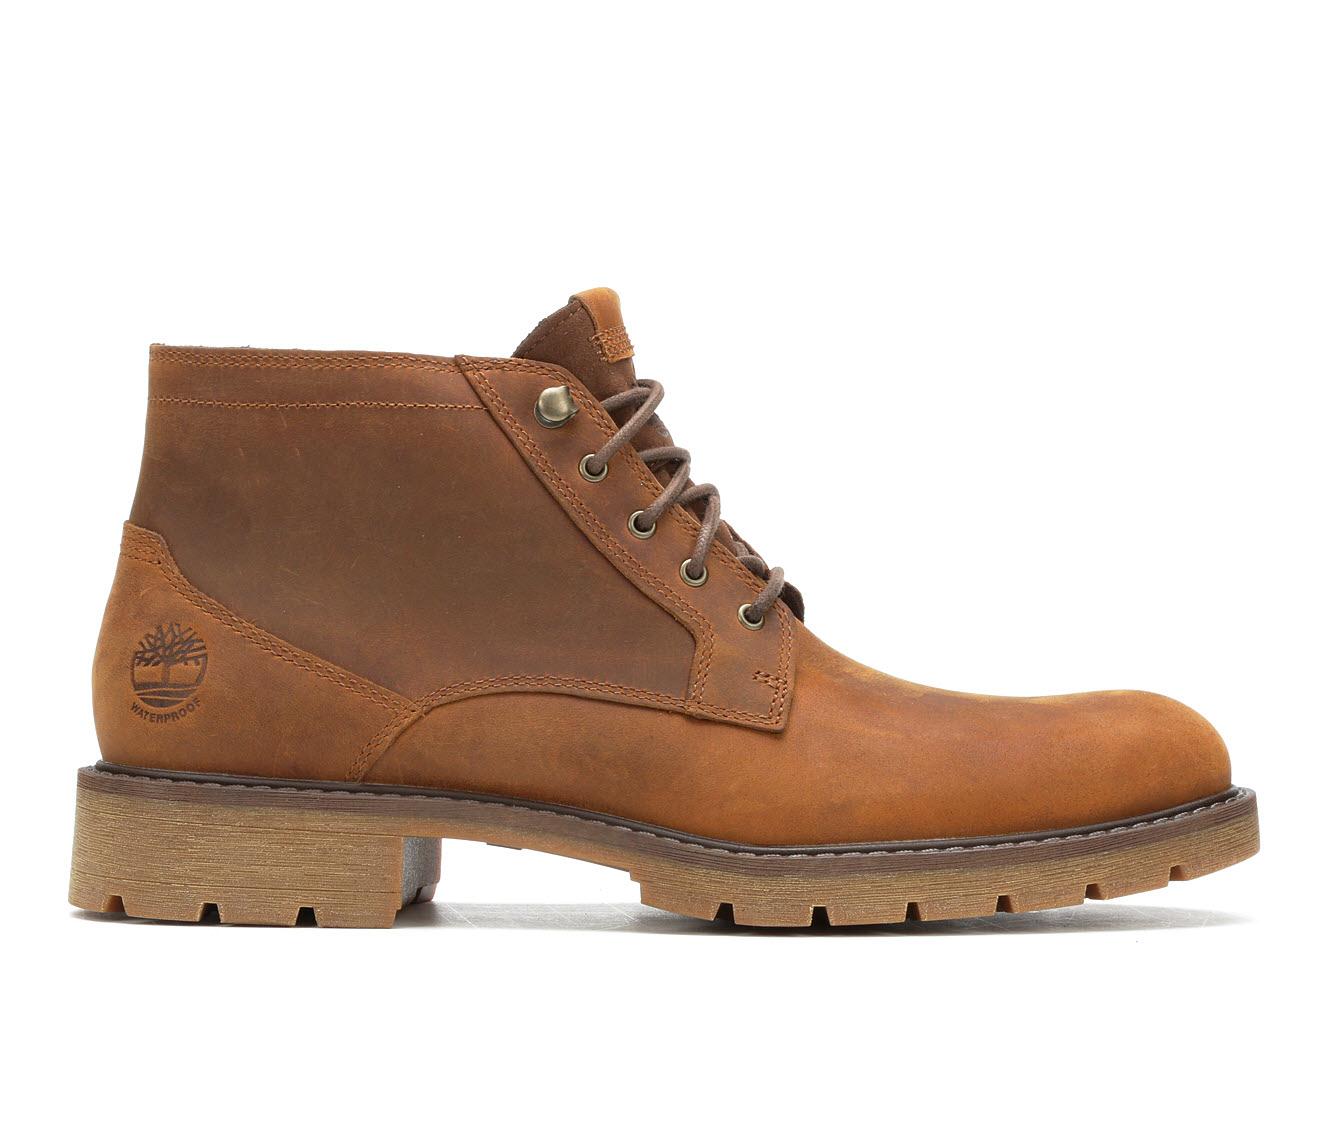 Timberland Elmhurst Chukka Men's Boots (Brown Leather)